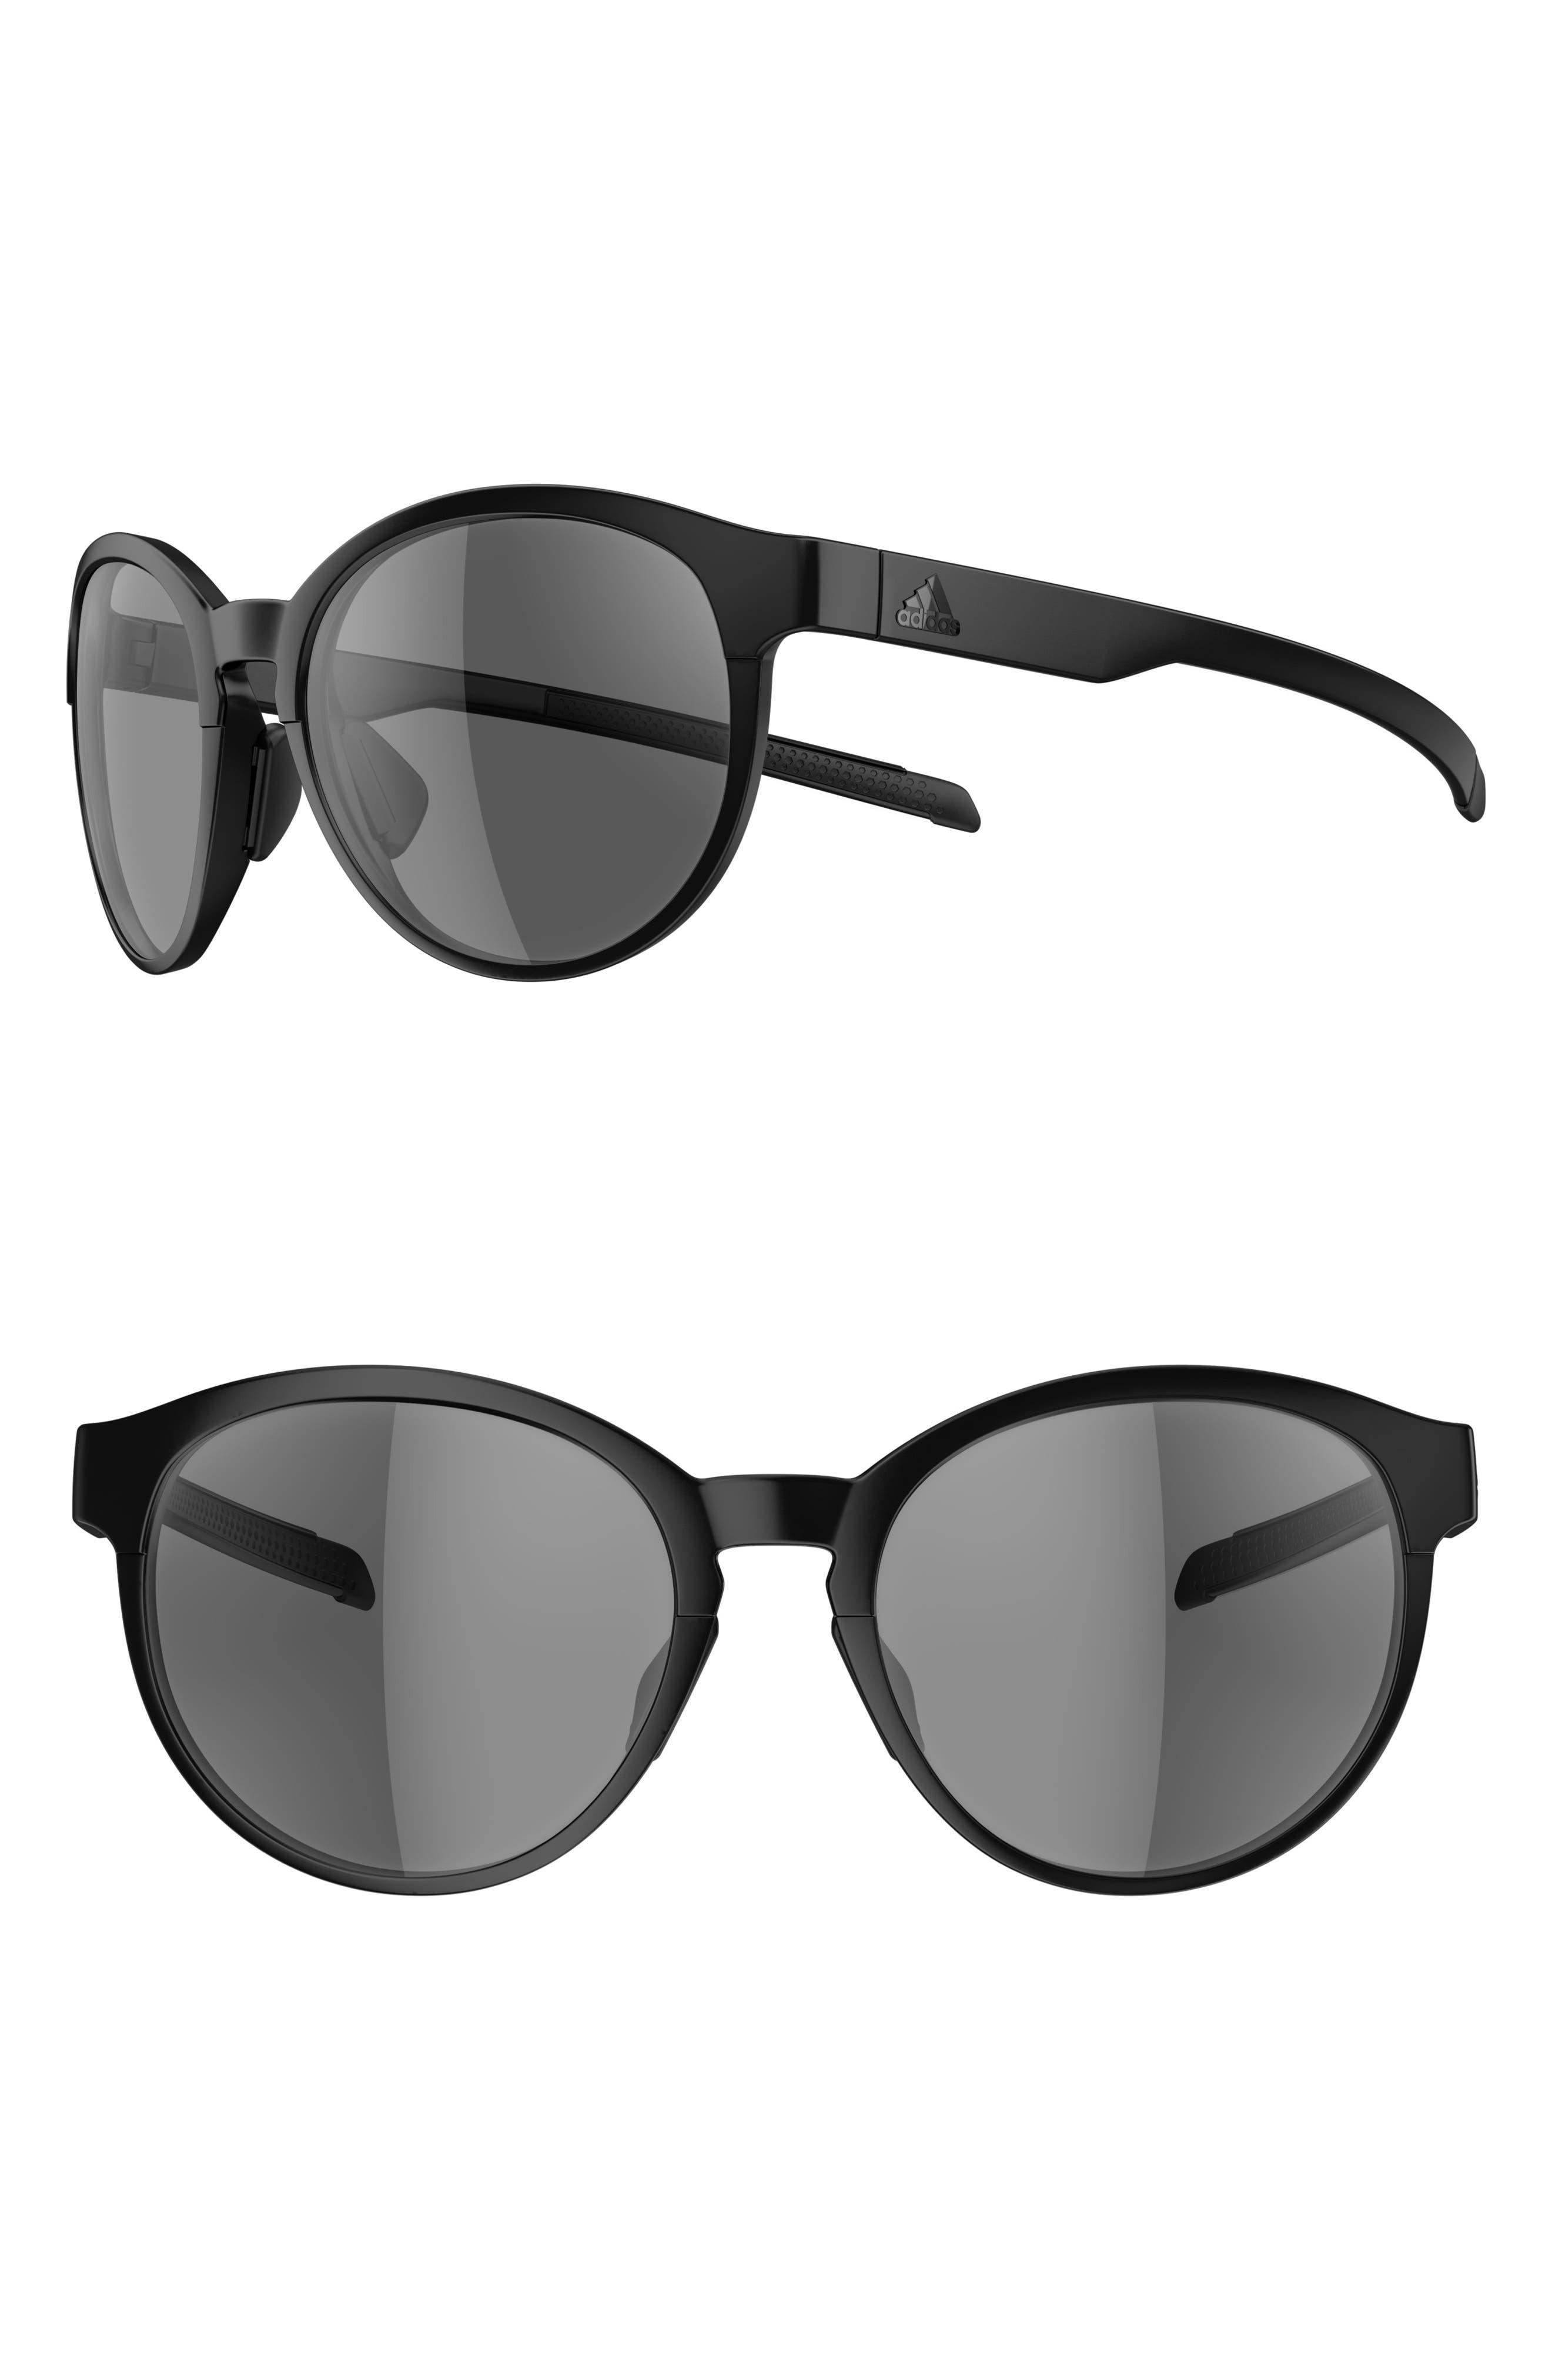 Beyonder 55mm Training Sunglasses,                         Main,                         color, BLACK MATTE/ GREY